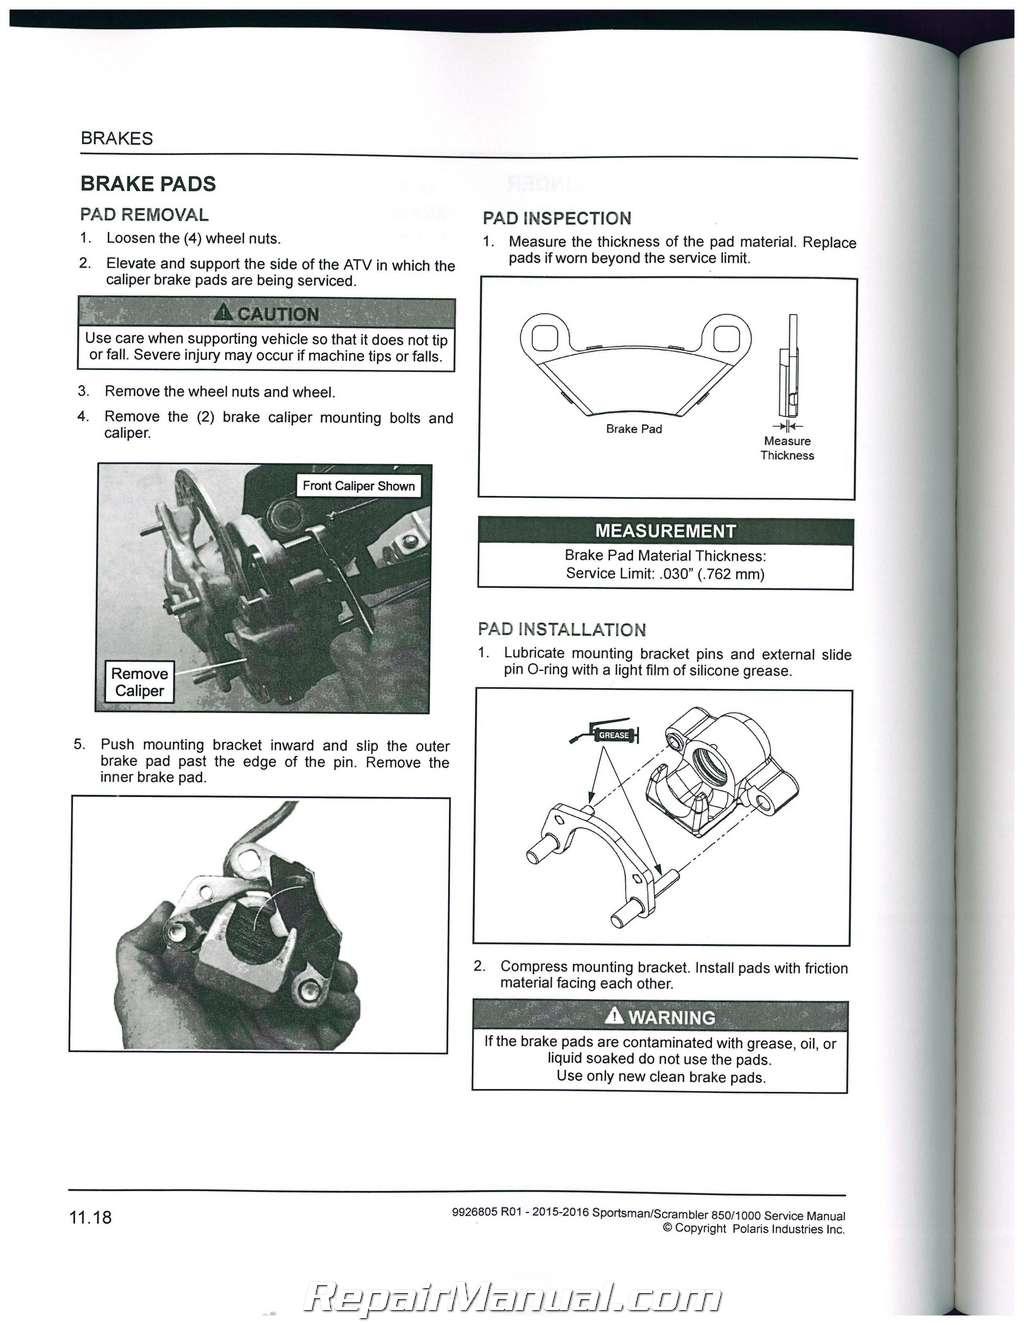 2015 2016 polaris scrambler sportsman 850 1000 atv service manual rh repairmanual com 2008 Polaris Scrambler 525 2006 Polaris Scrambler